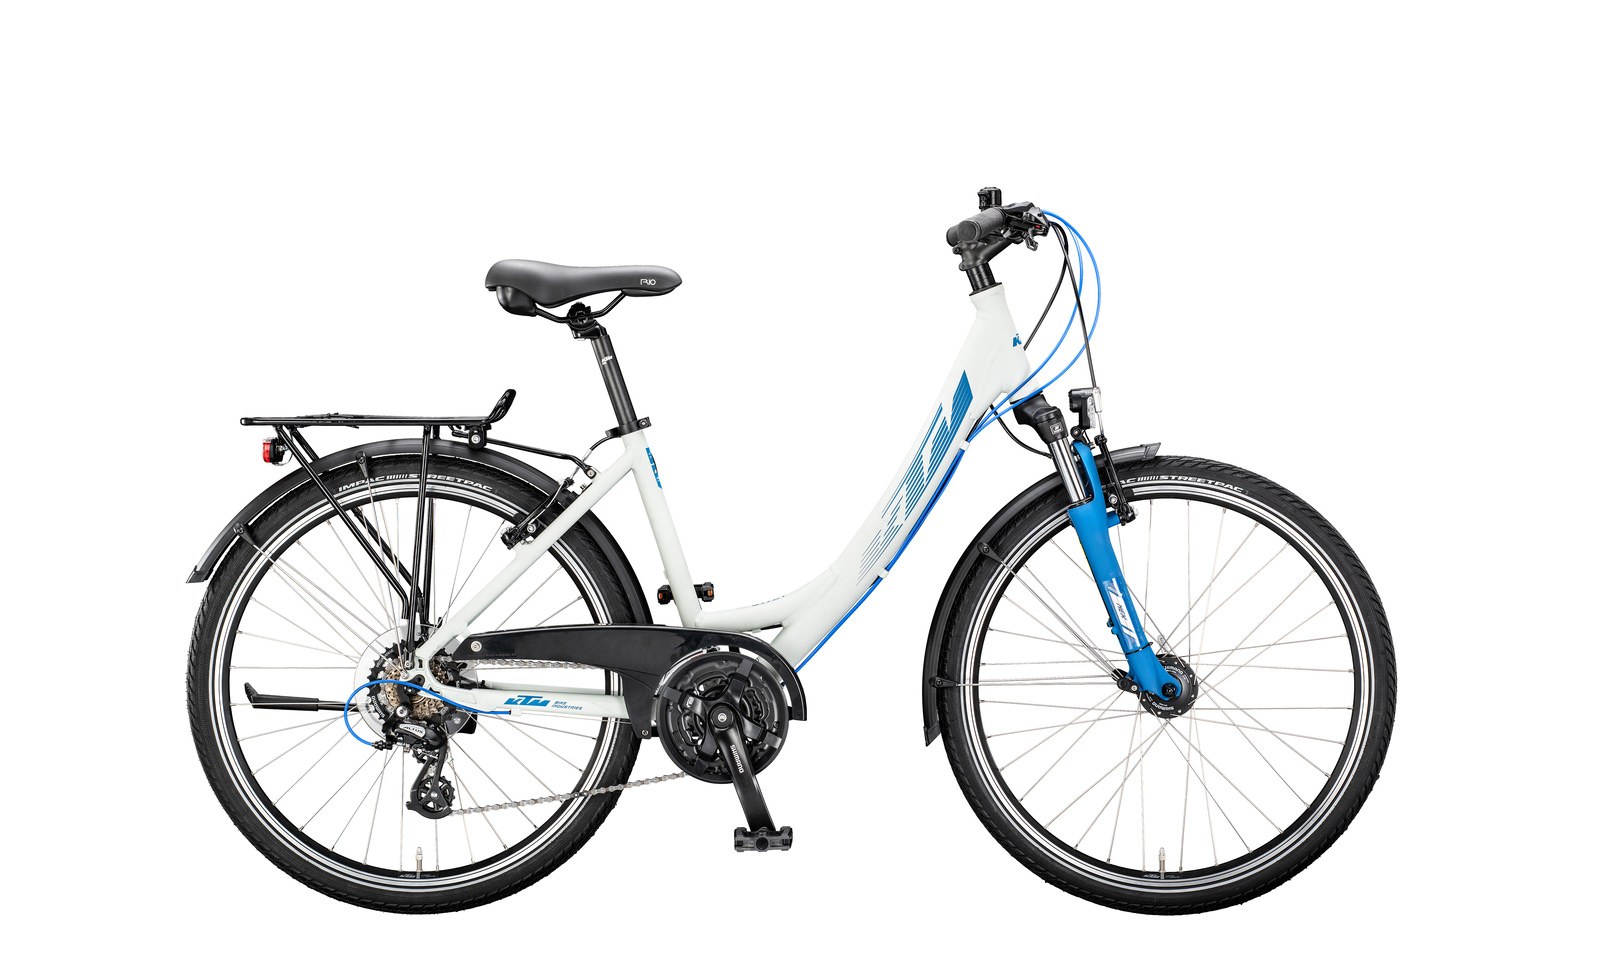 Biciclete KTM Kids COUNTRY STAR 26.21 3x7 Shimano Altus